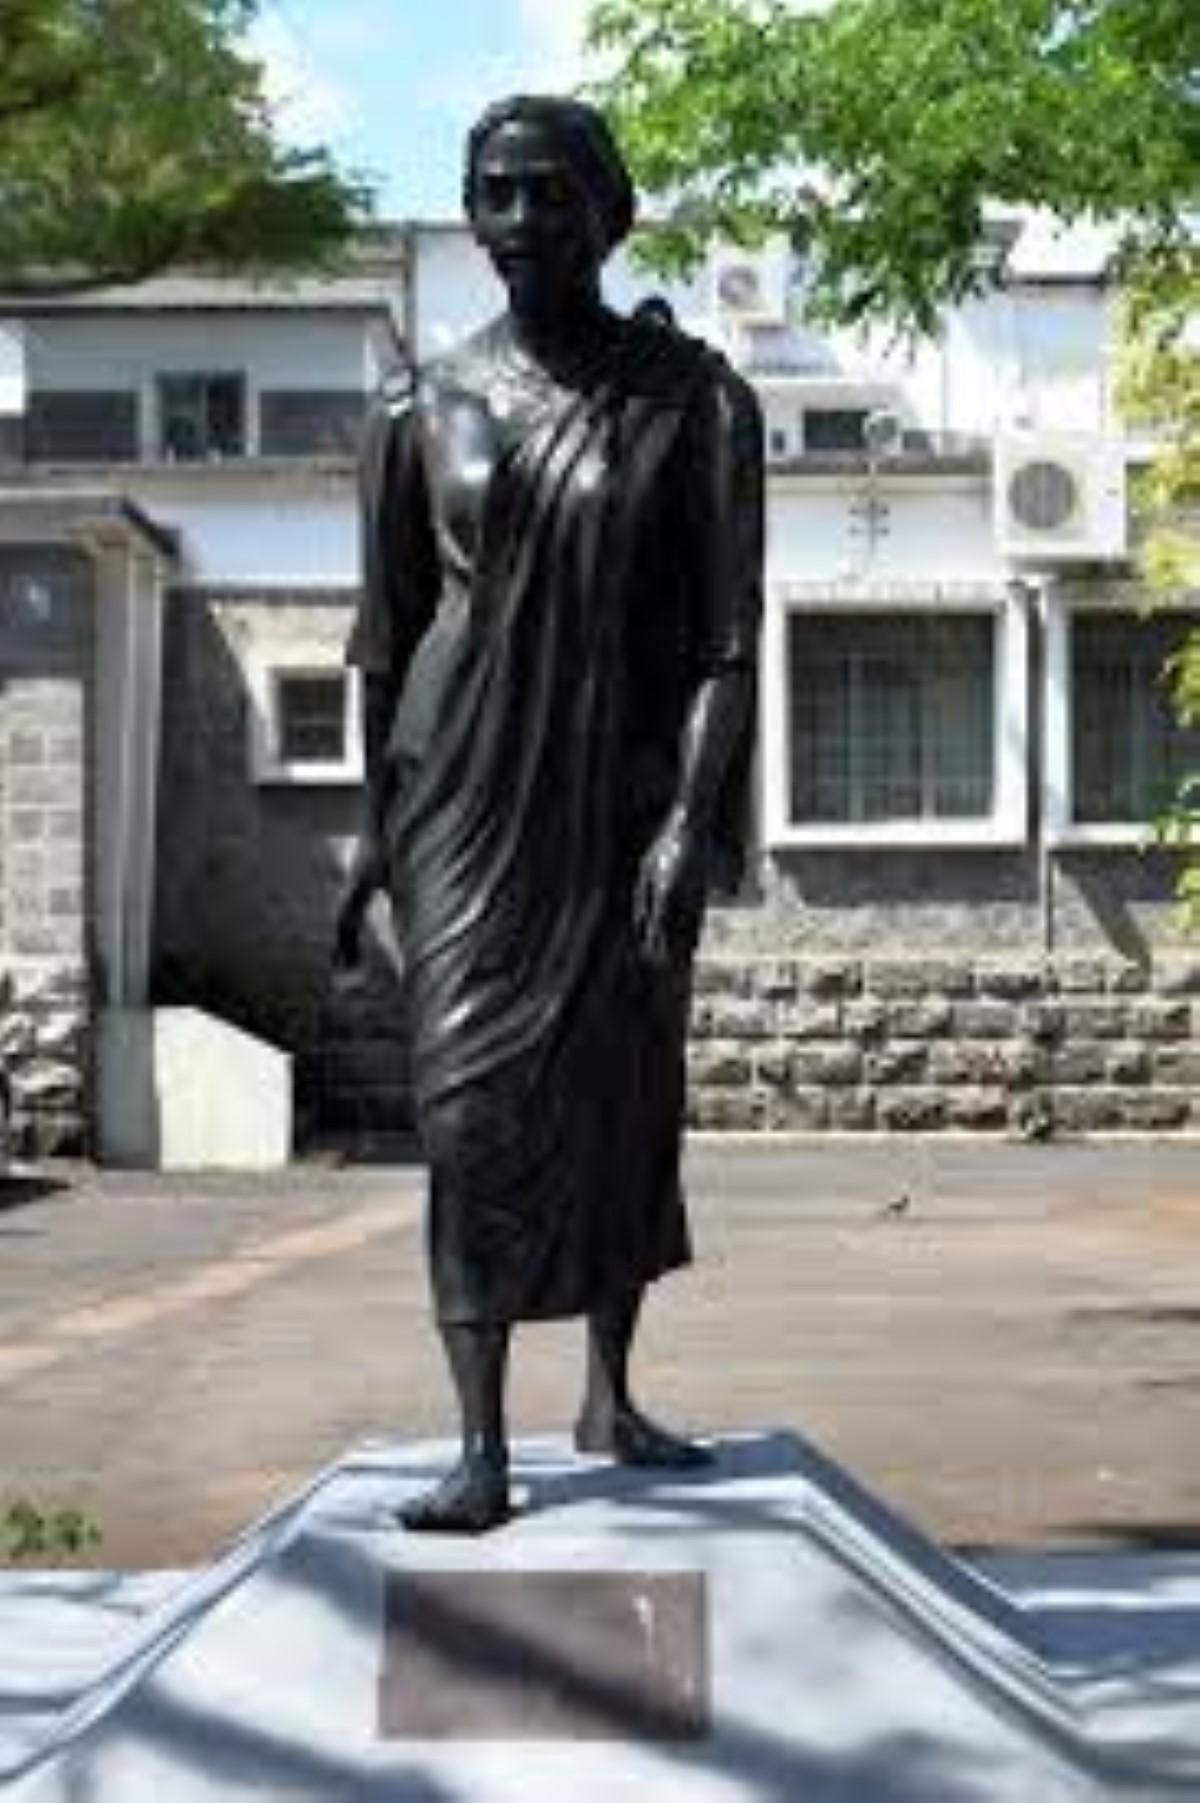 [Histoire] Anjalay Coopen femme et militante hautement symbolique